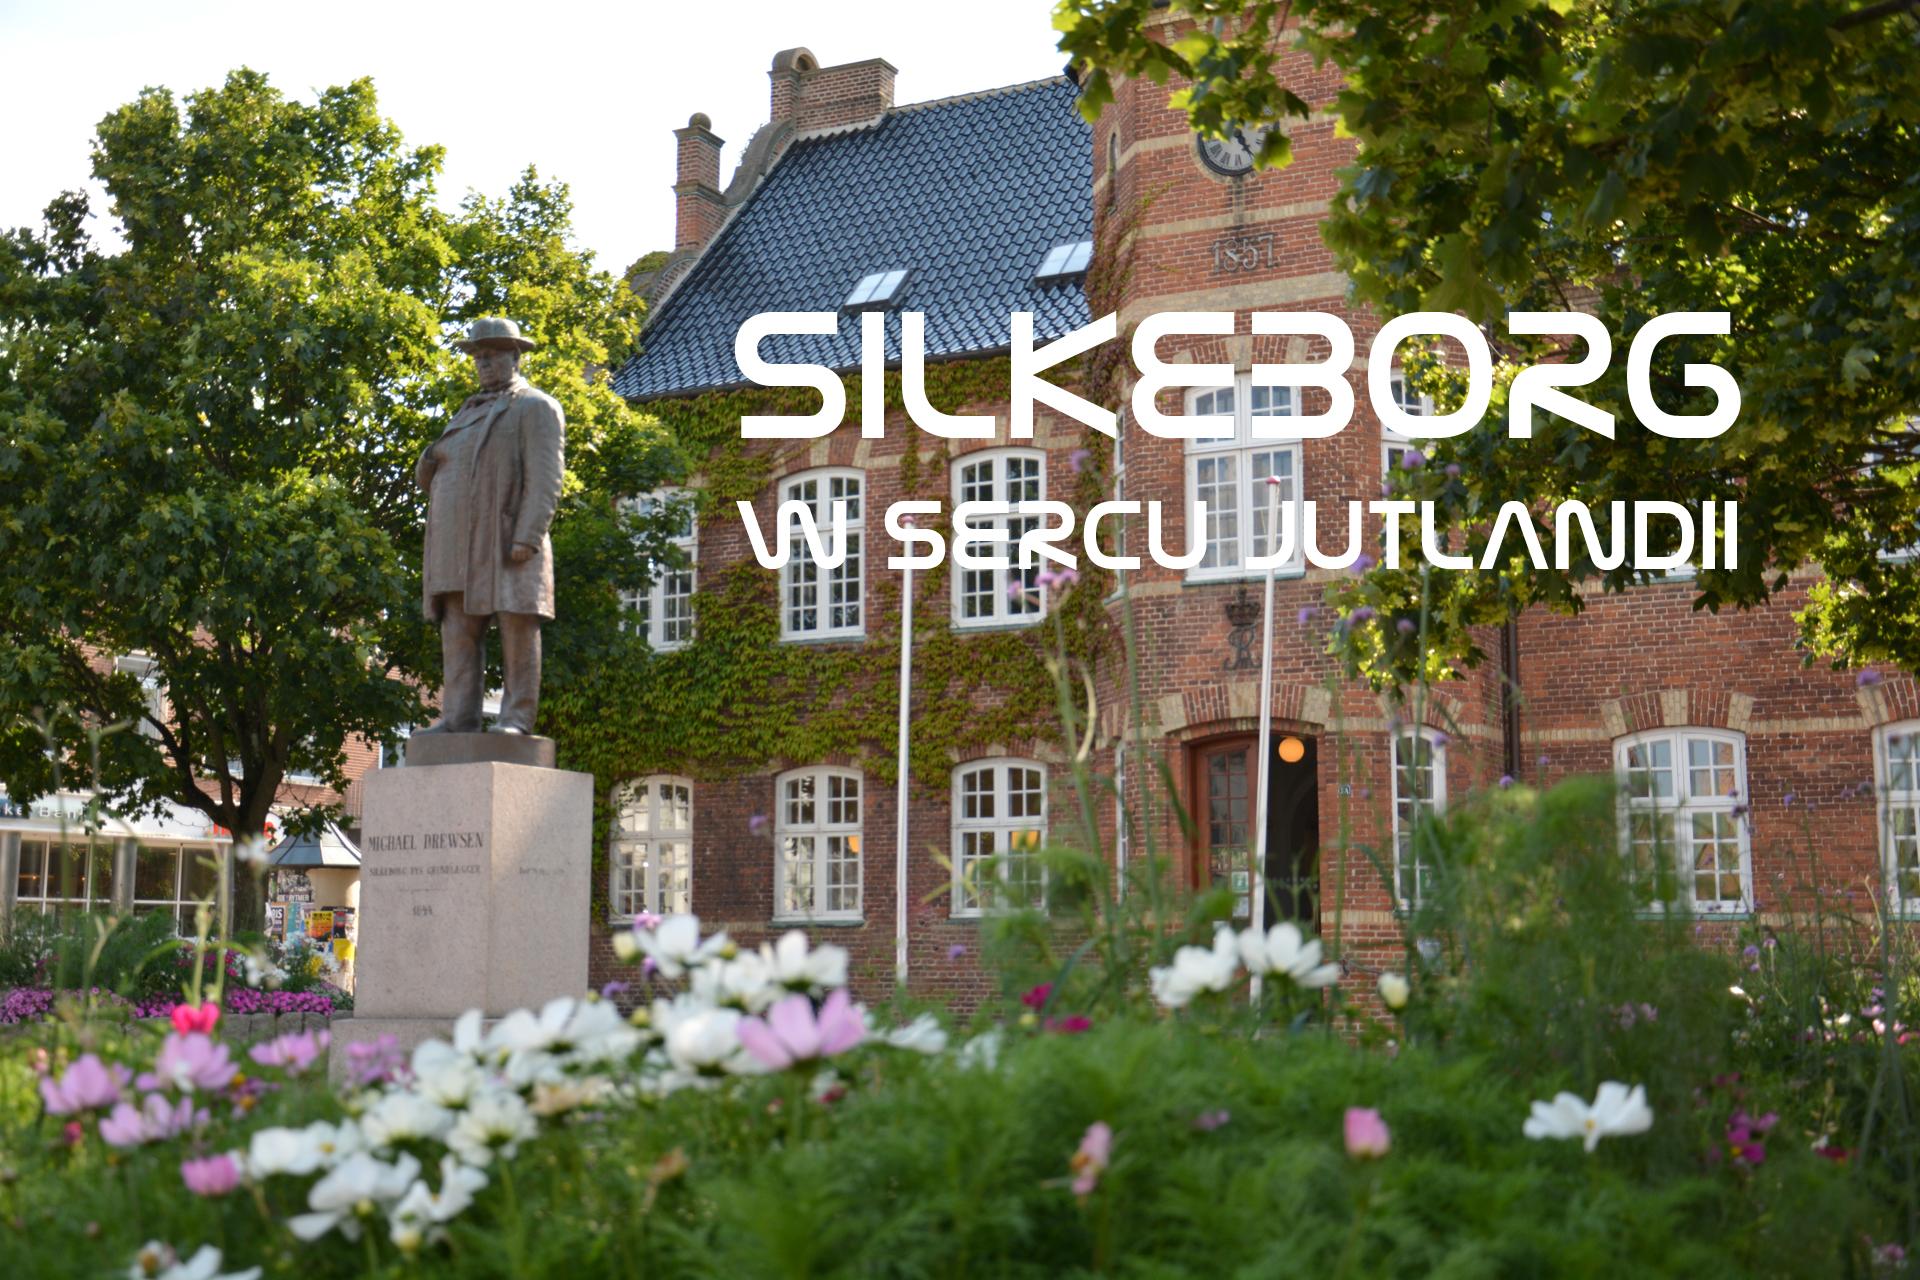 Silkeborg - atrakcje turystyczne